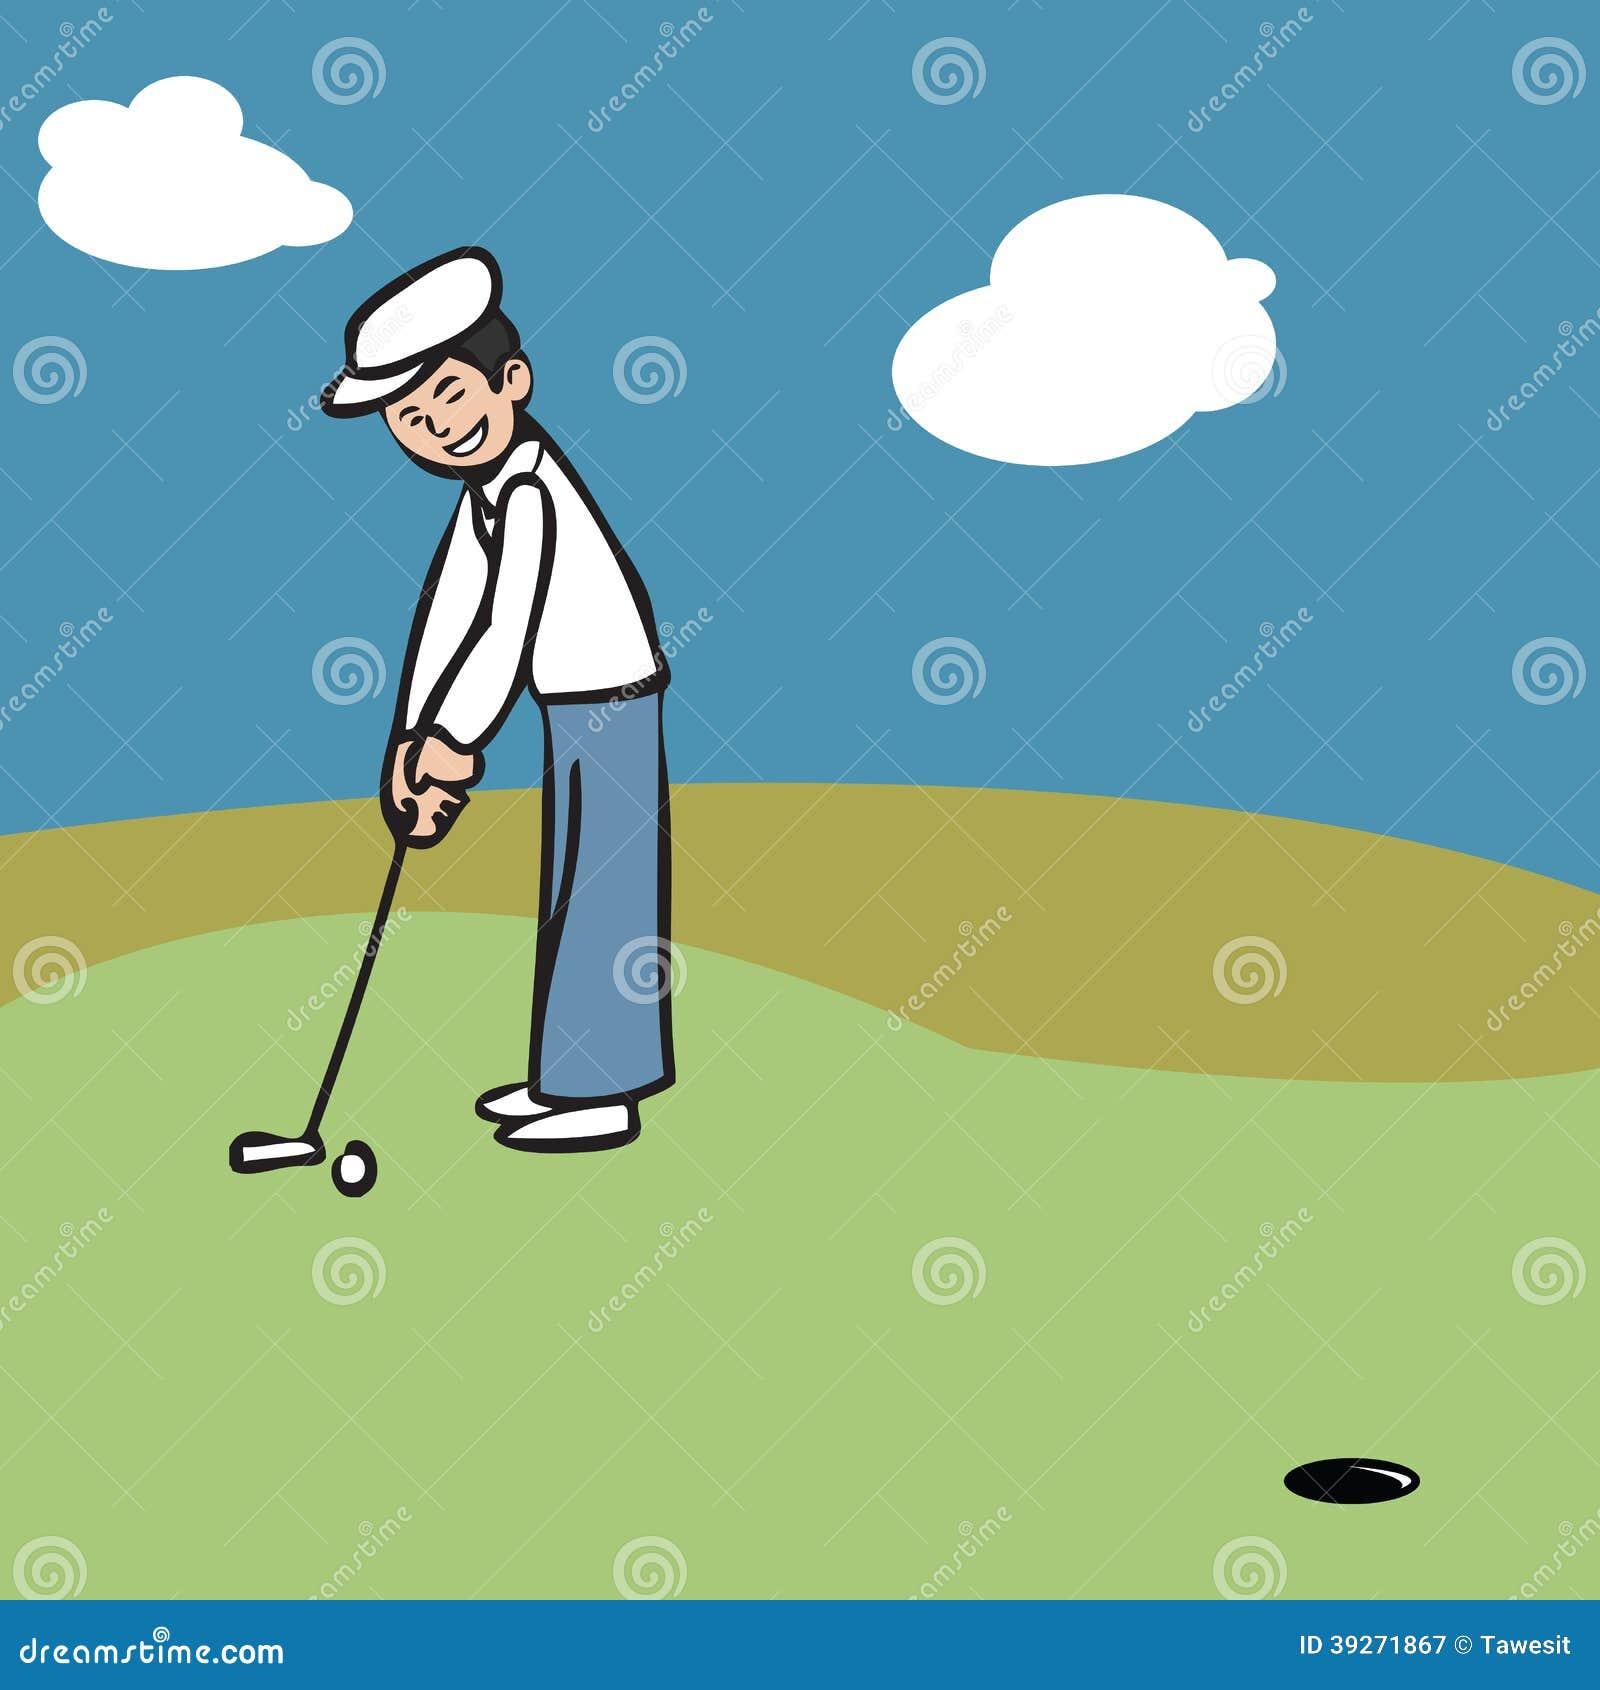 Vacation Man Putting Golf Illustration 39271867 - Megapixl on cartoon golf club clip art, cartoon golf club swing, the step to draw a cartoon golf club, cartoon man golf club,